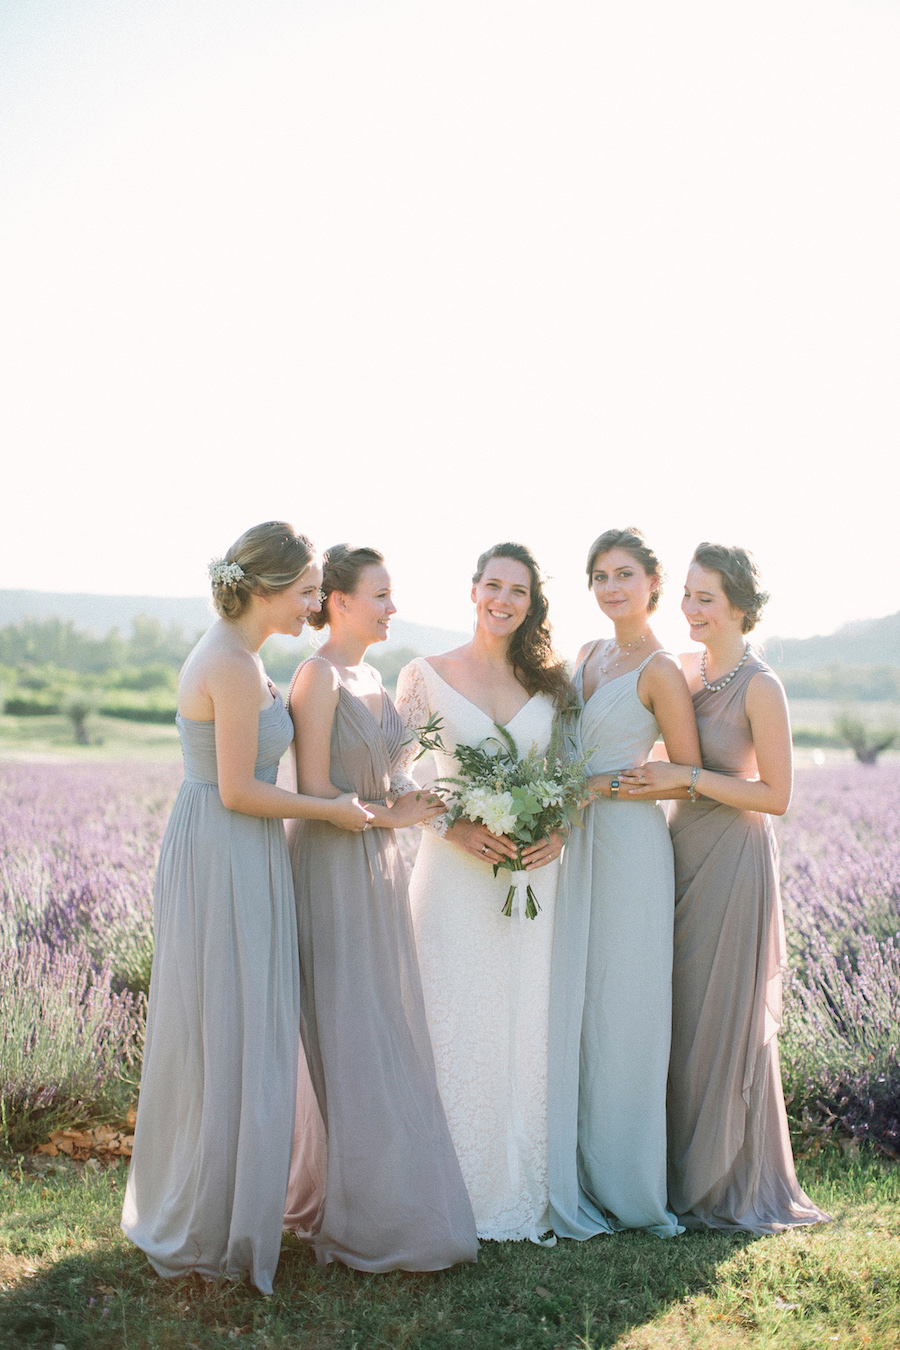 saya-photography-rustic-french-wedding-provence-domaines-de-patras-89.jpg